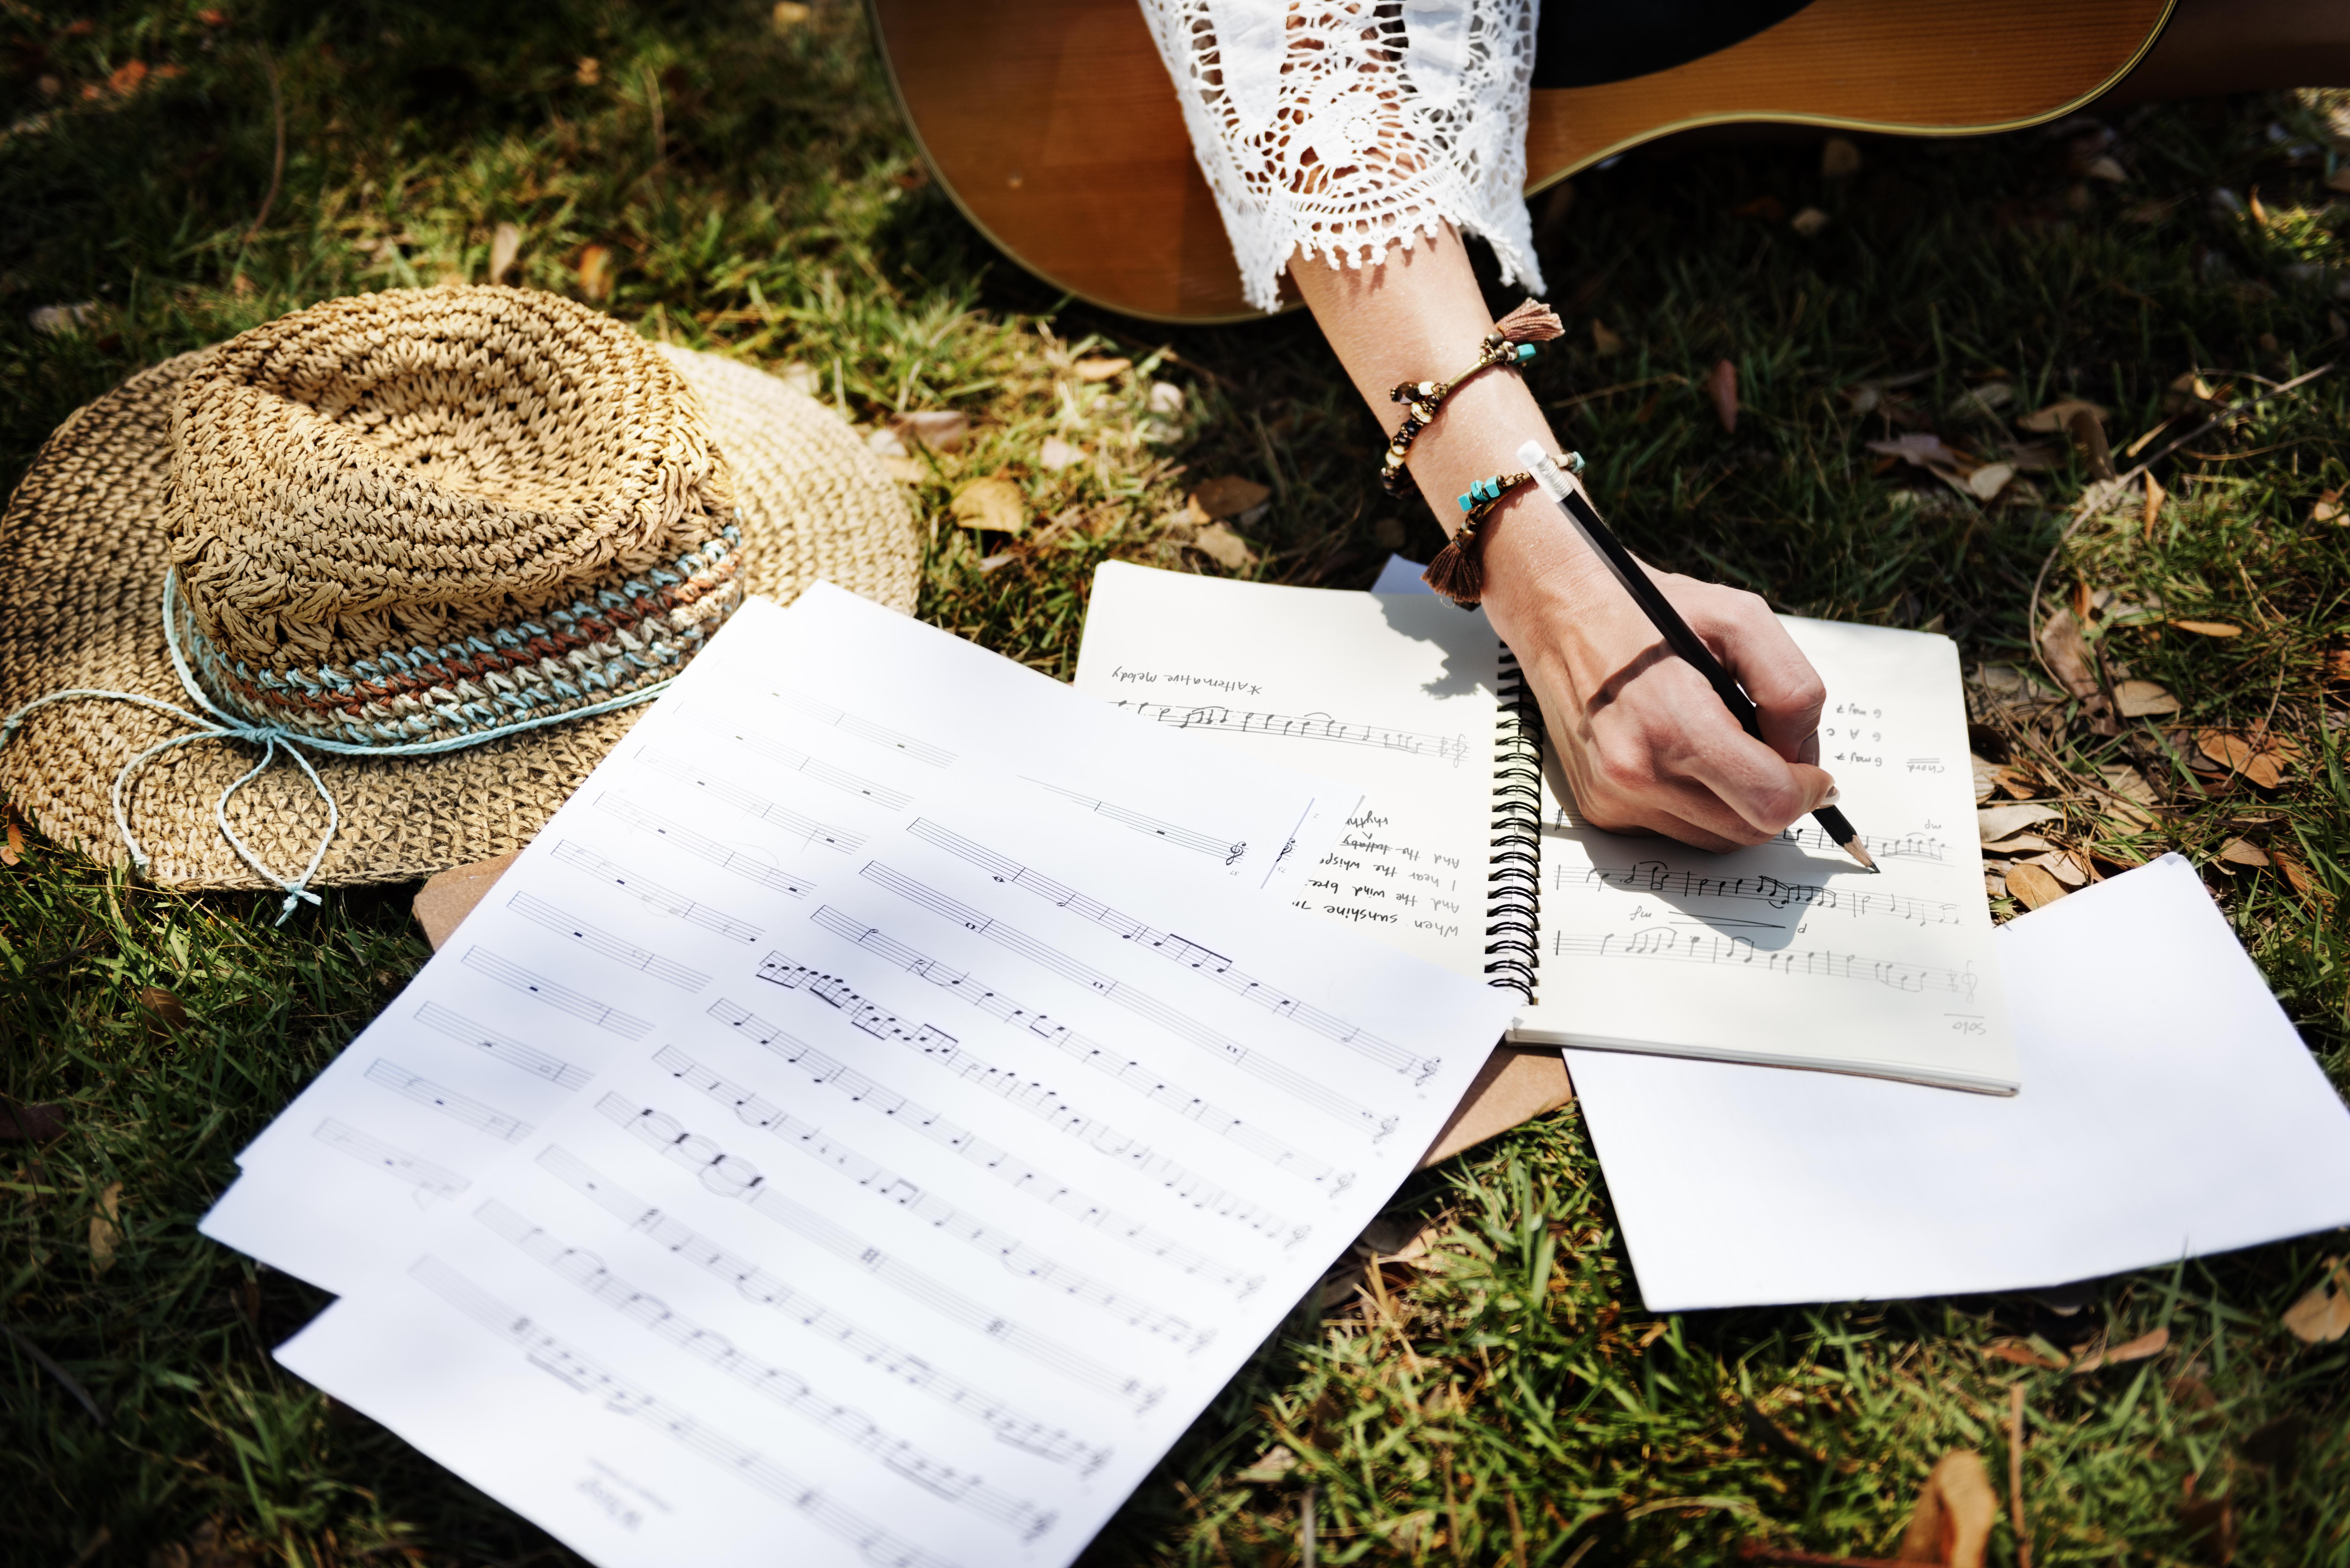 Organized Songwriter